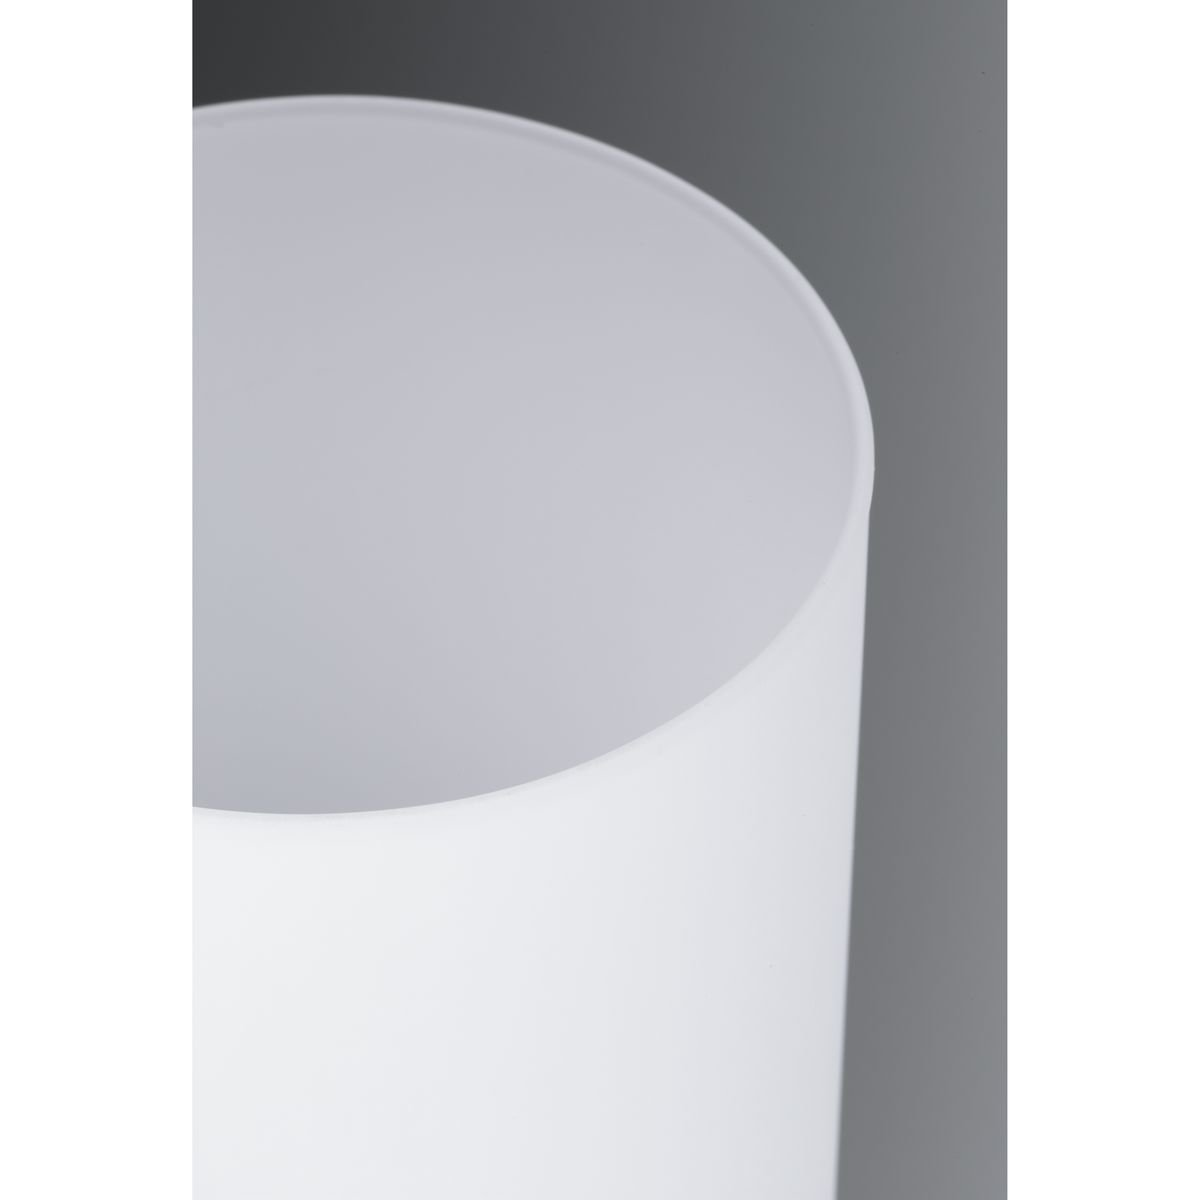 Progress Lighting P2159-09 Contemporary/Soft 3-100W Med Bath Bracket, Brushed Nickel by Progress Lighting (Image #4)